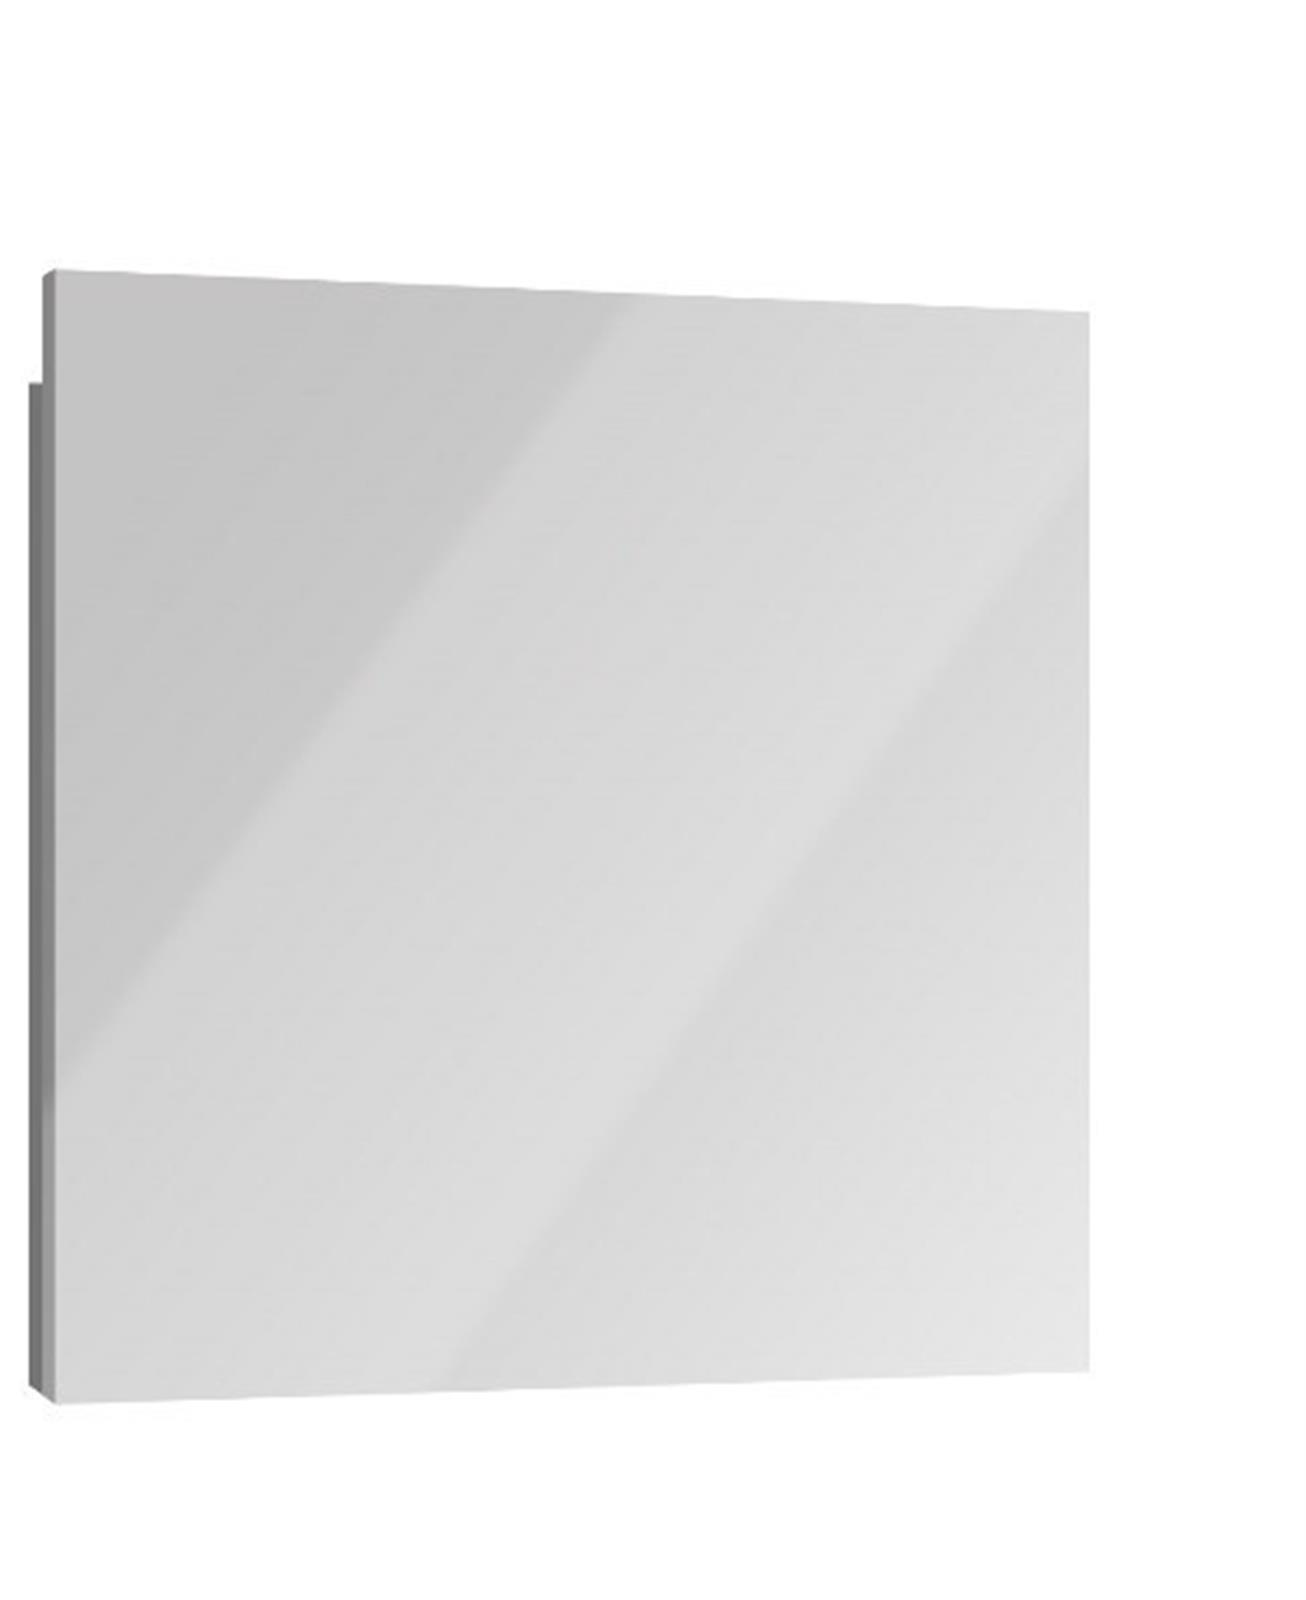 Miroir dco srie adesio 3 sanitaire distribution for Le miroir casse